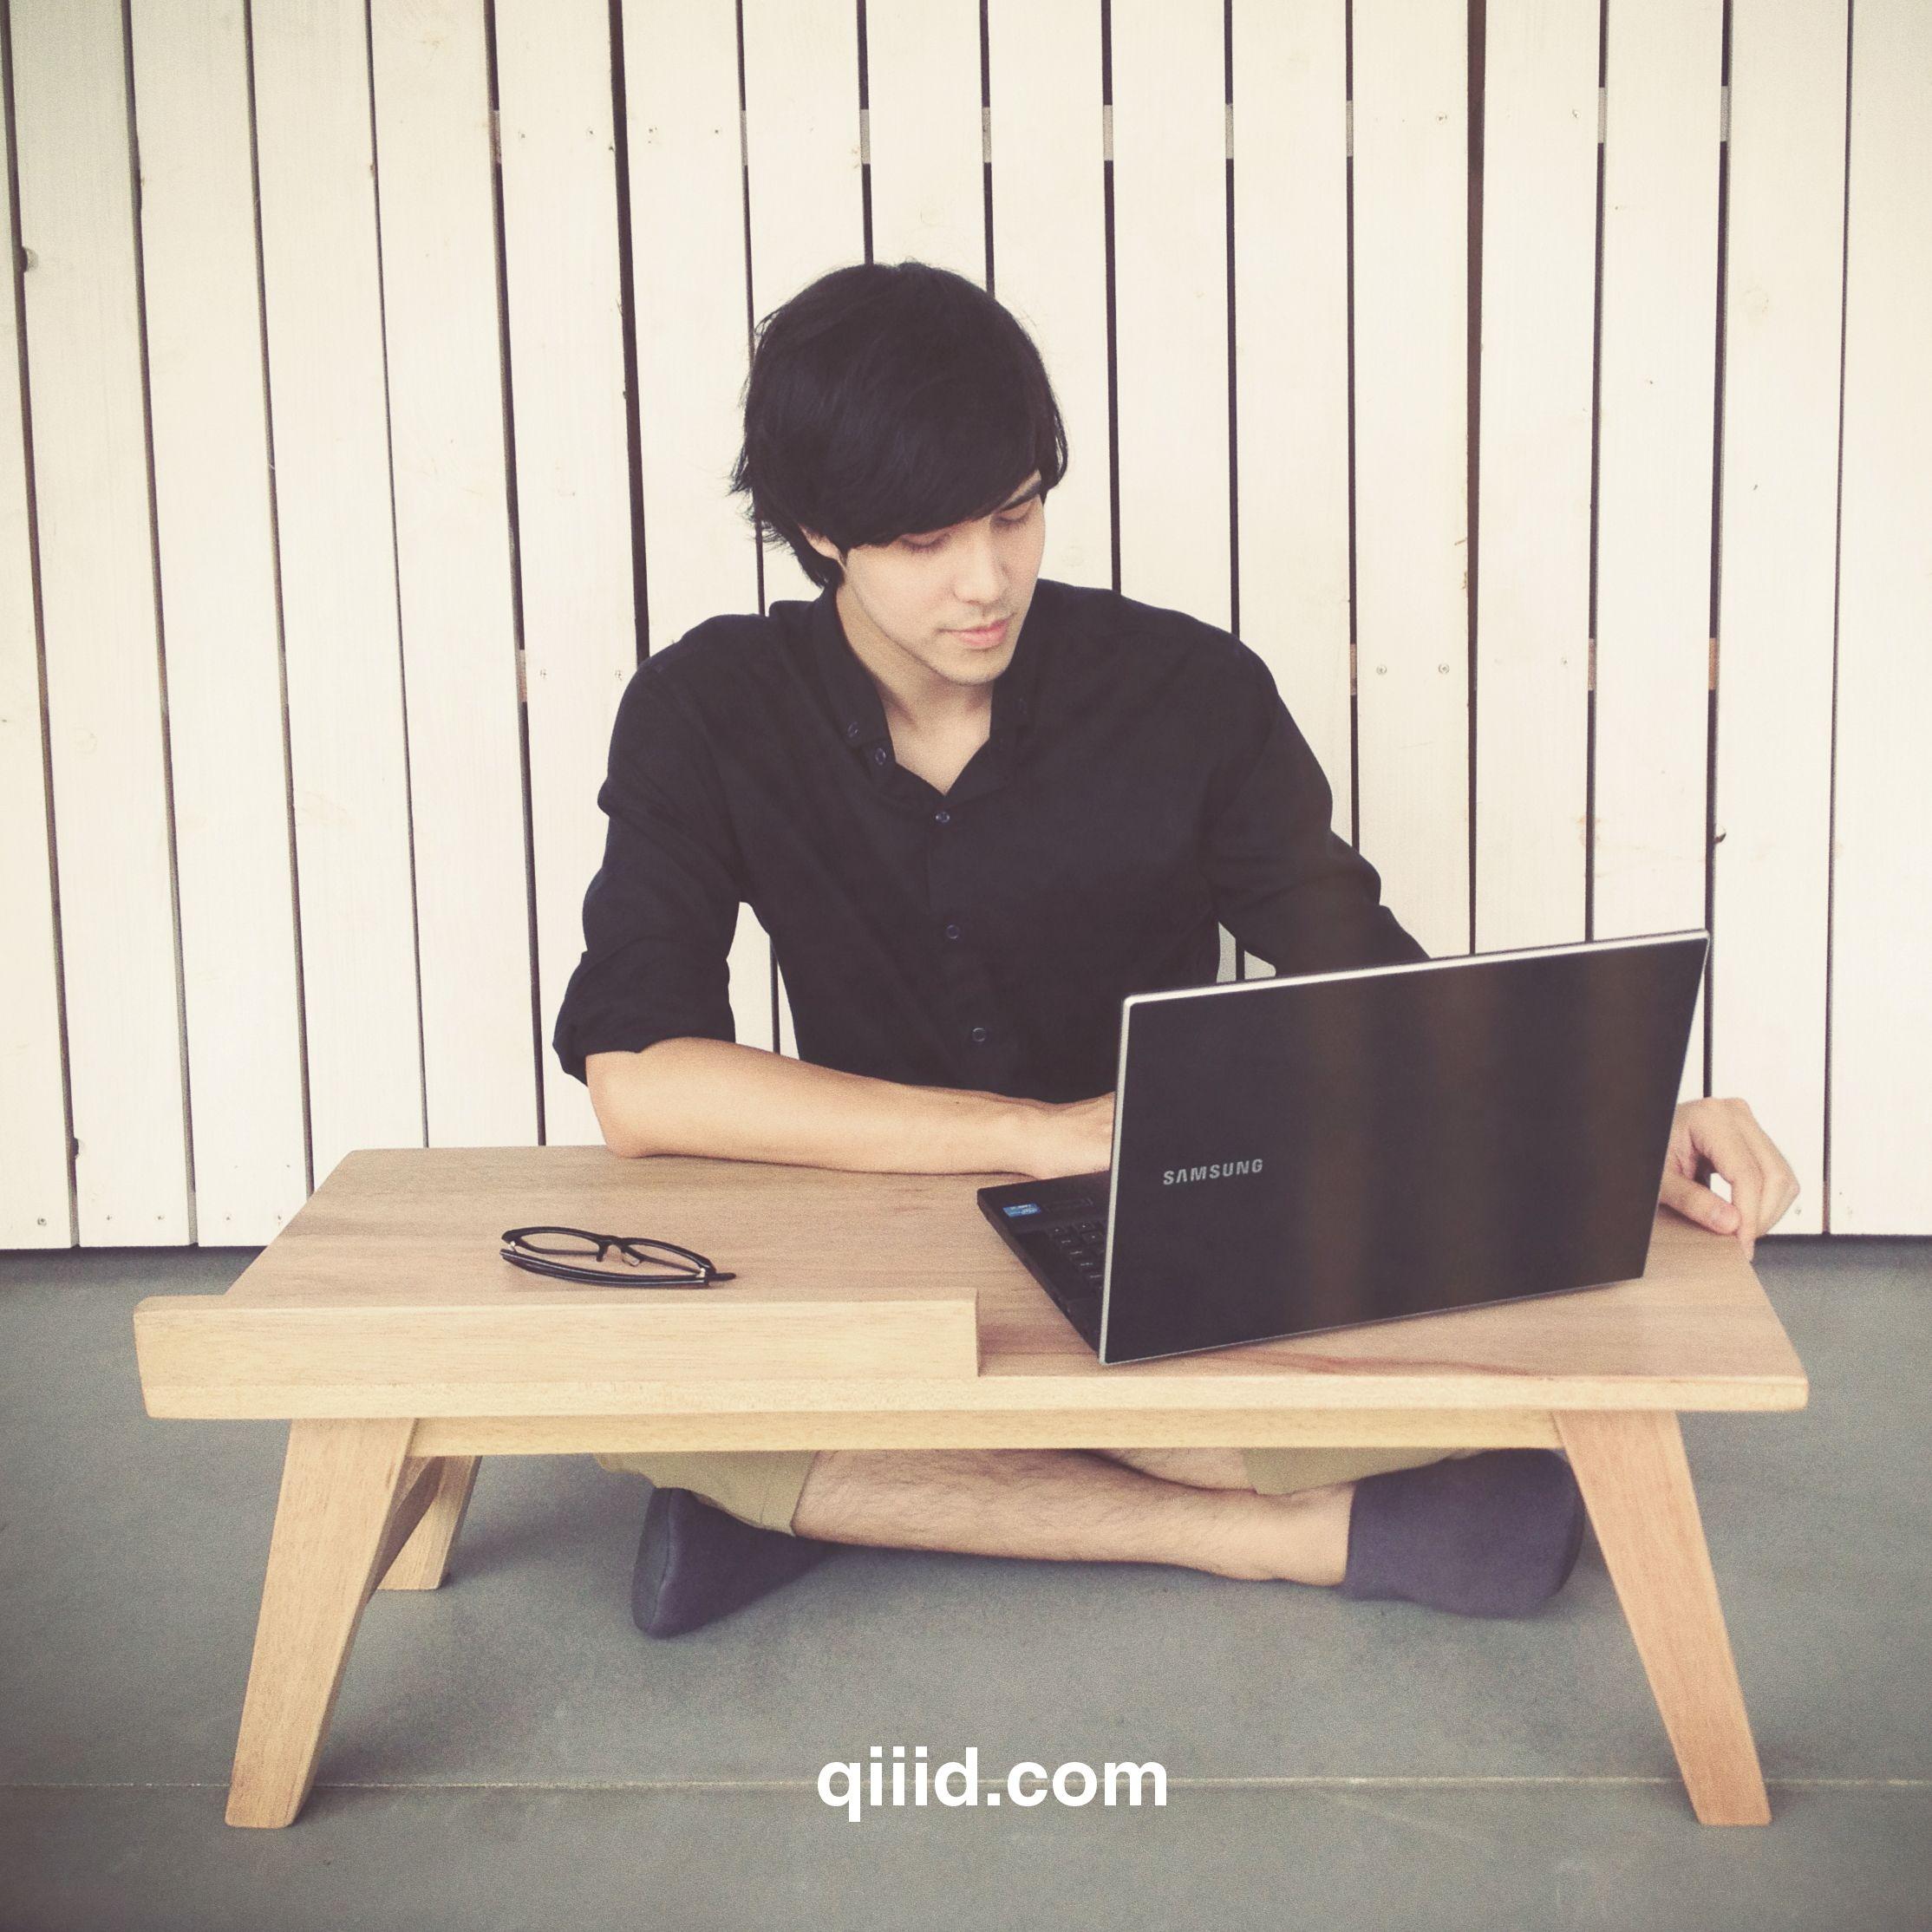 Www Qiiid Com Floor Desk Japanese Decor Japanese Dining Table